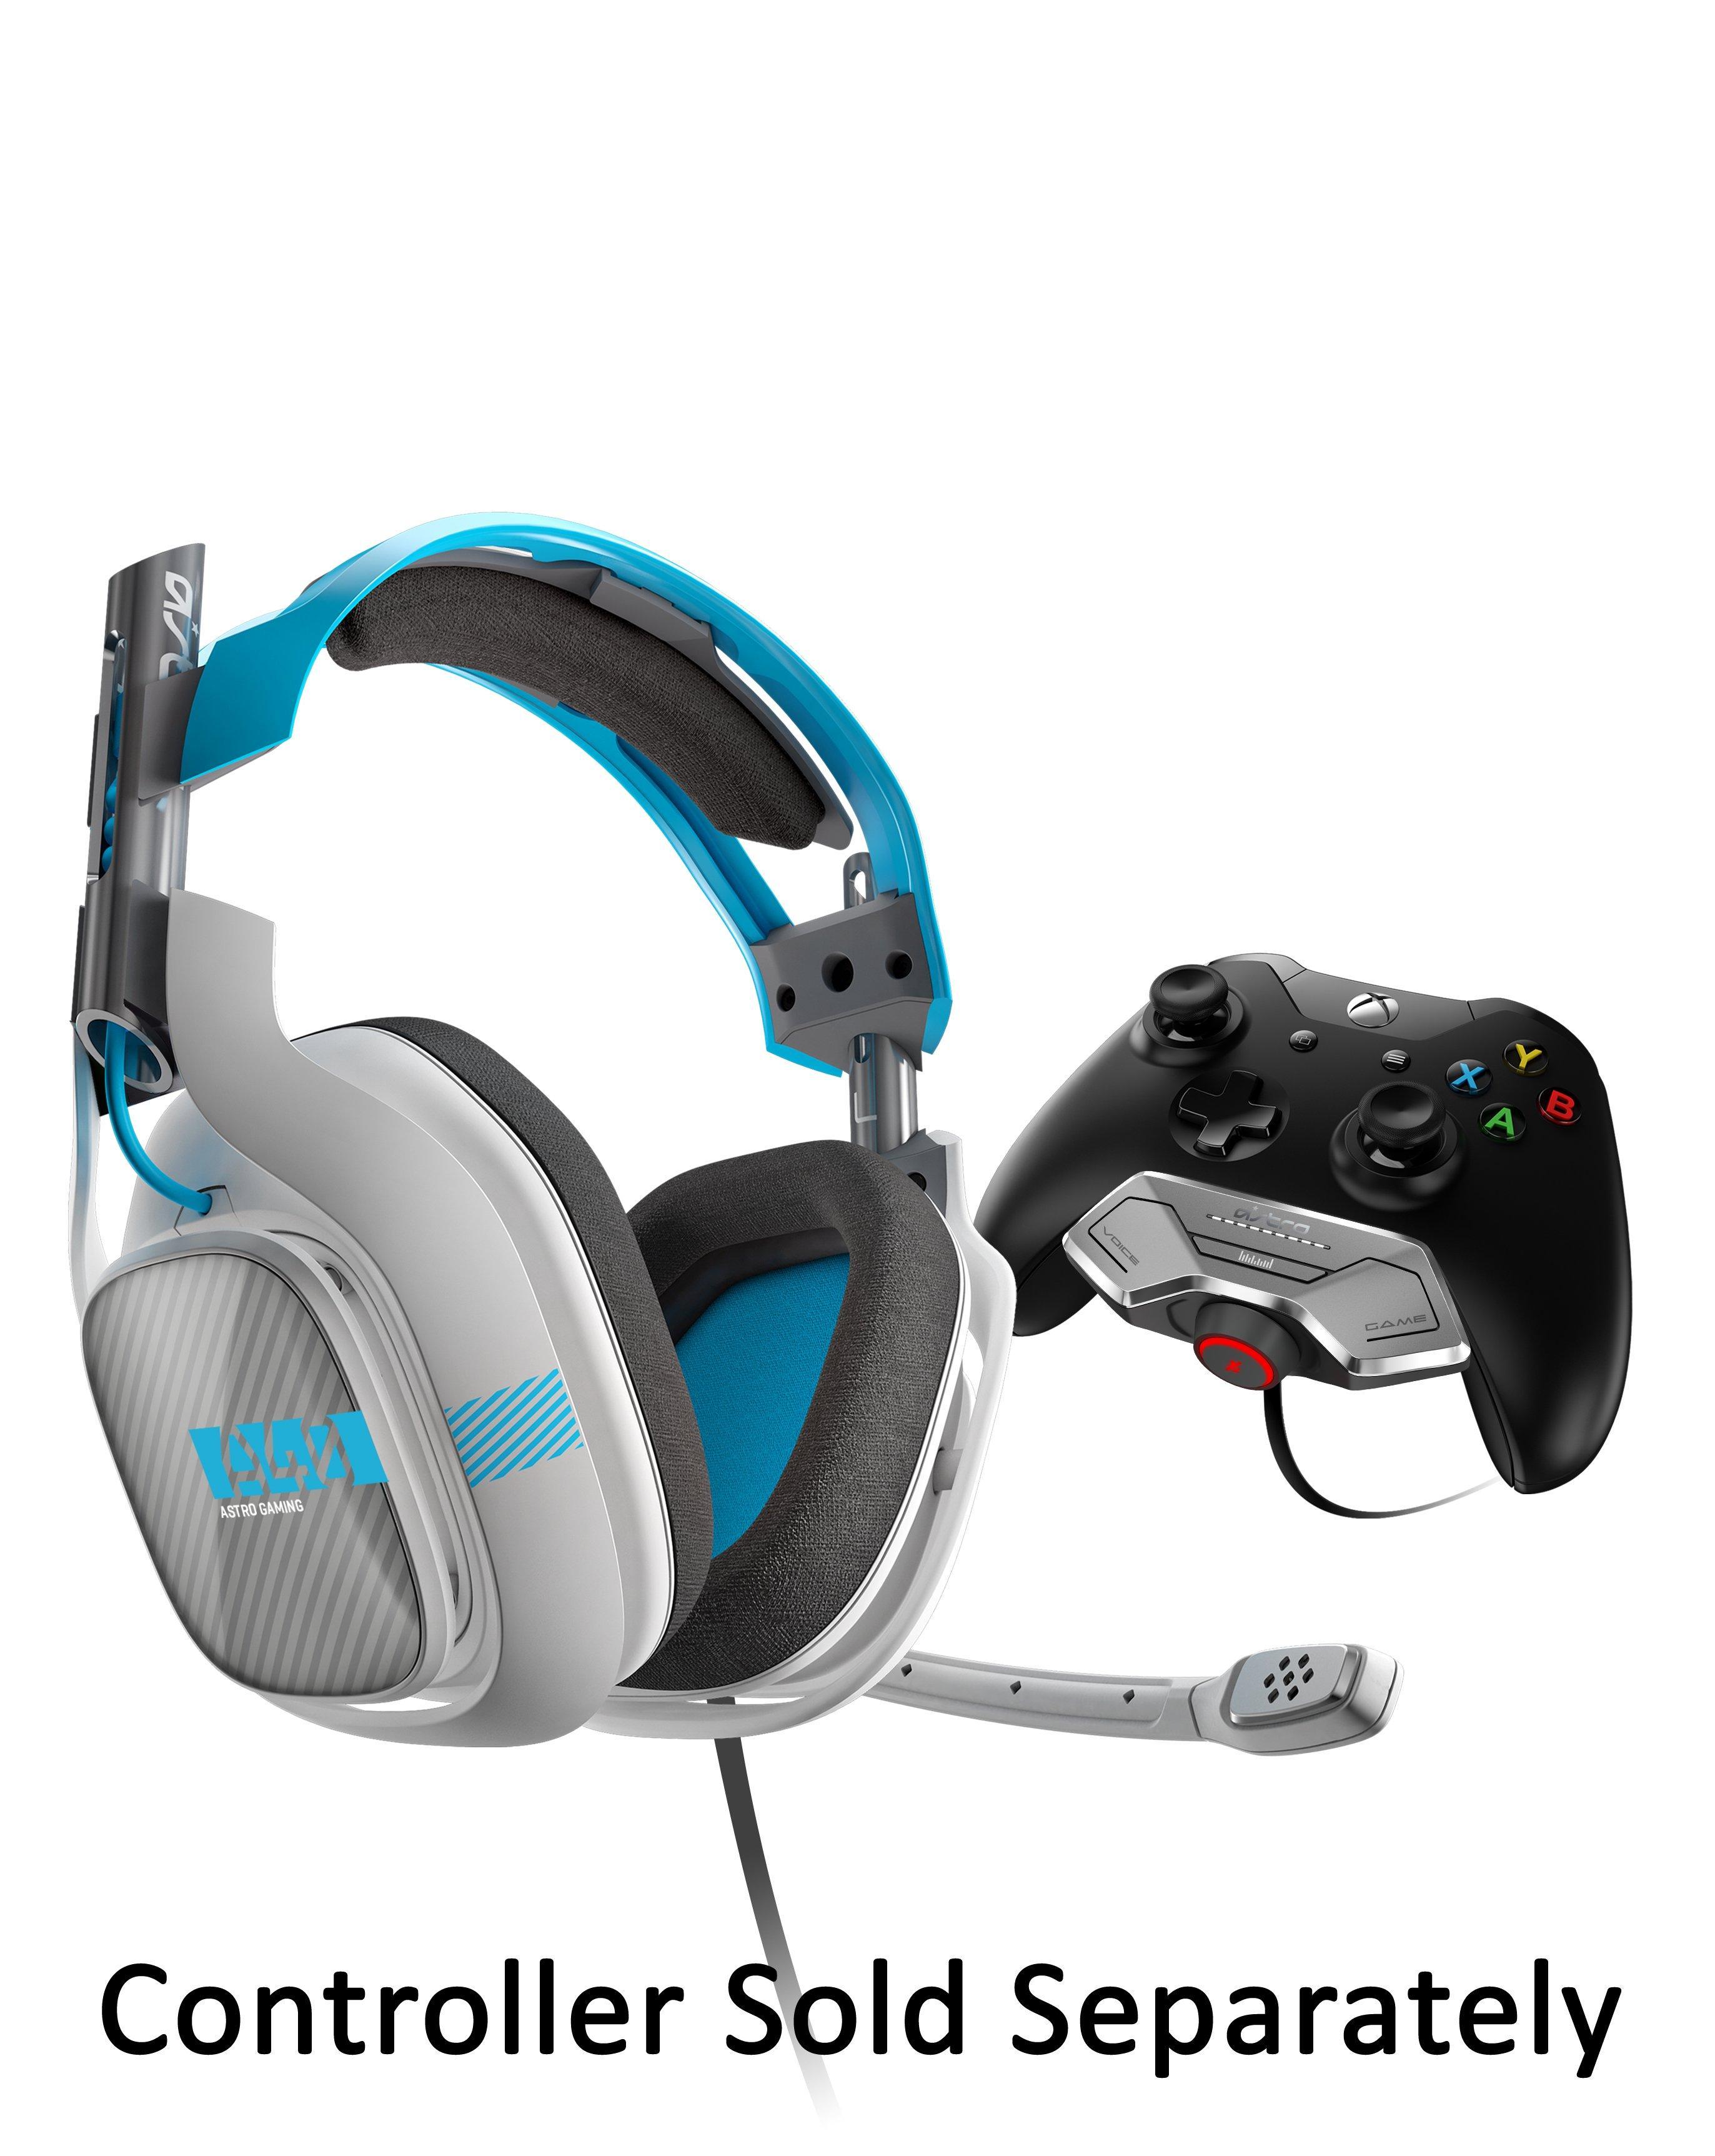 Astro A50 Gamestop : astro, gamestop, Wired, Gaming, Headset, MixAmp, Astro, Refurbished, GameStop